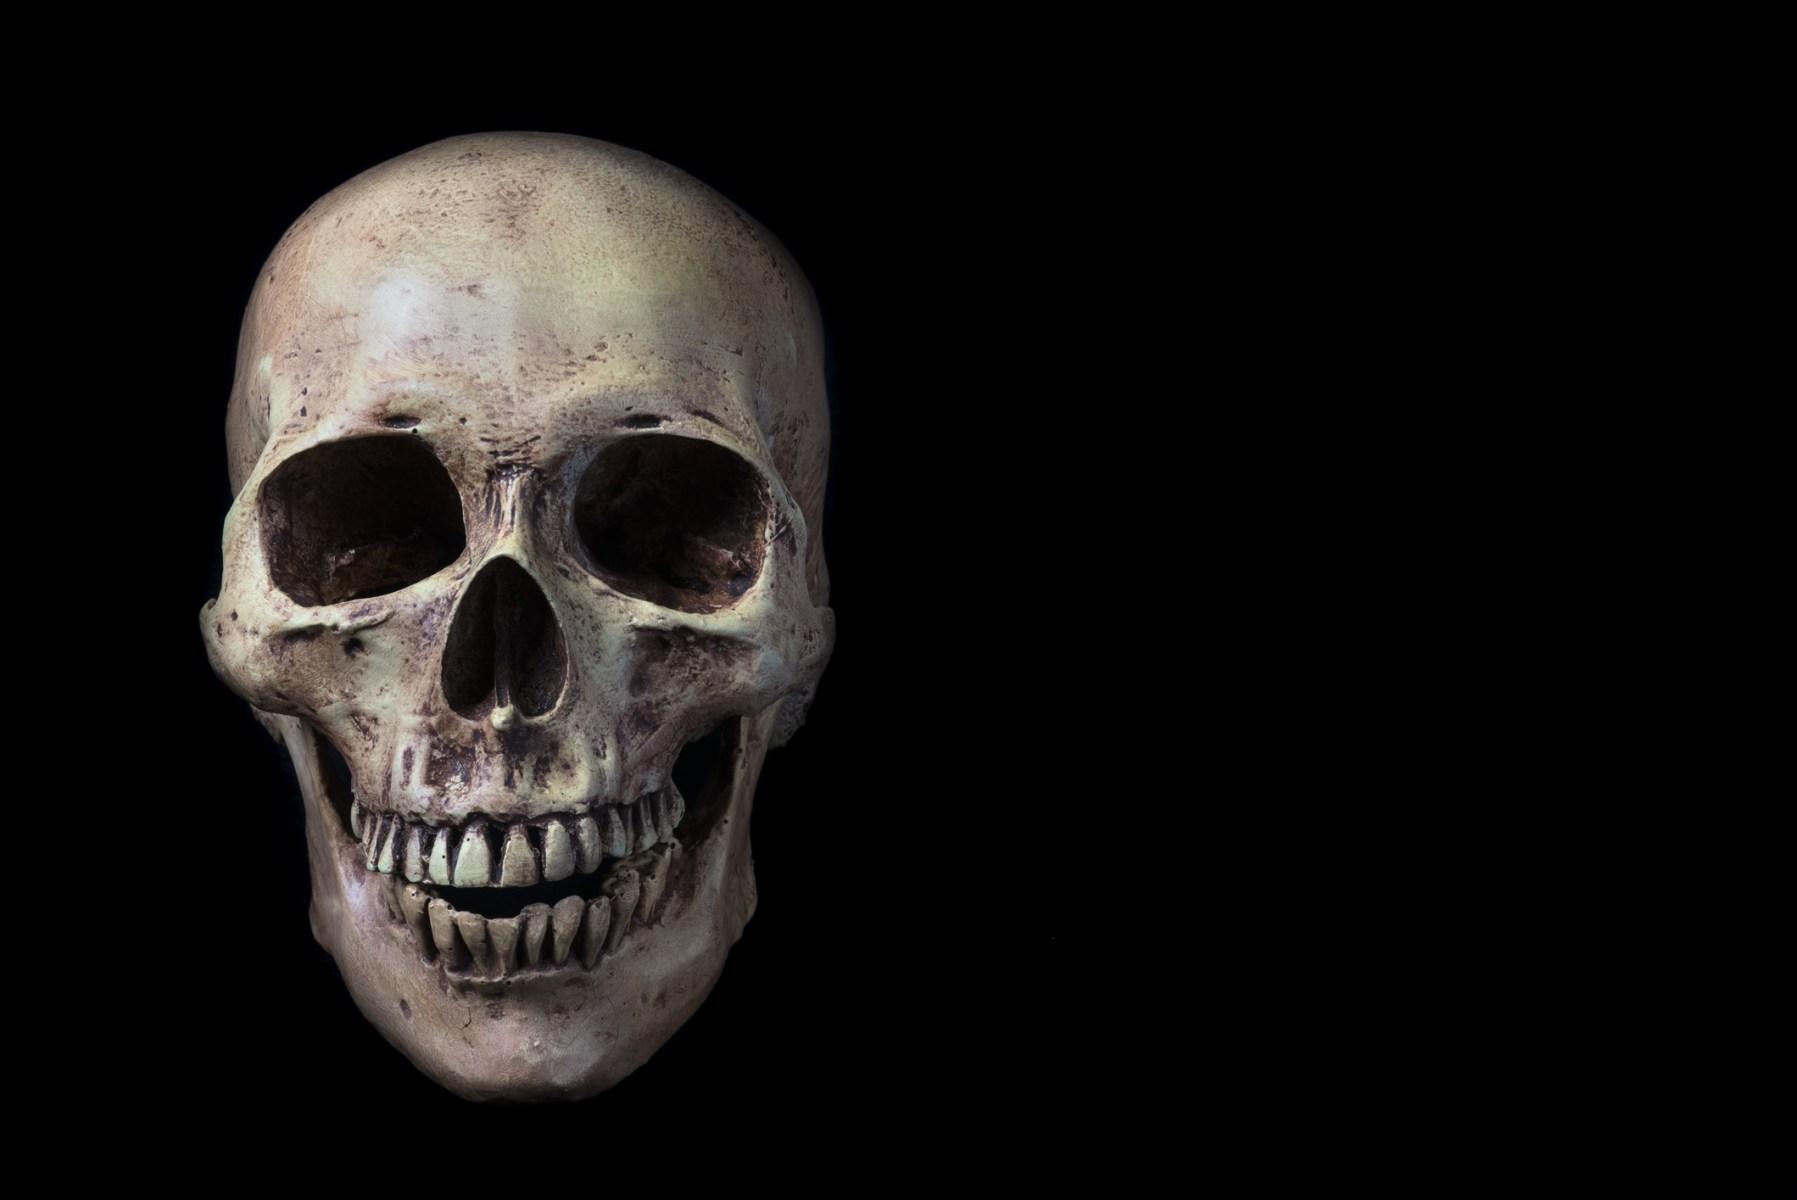 human cousin bones found